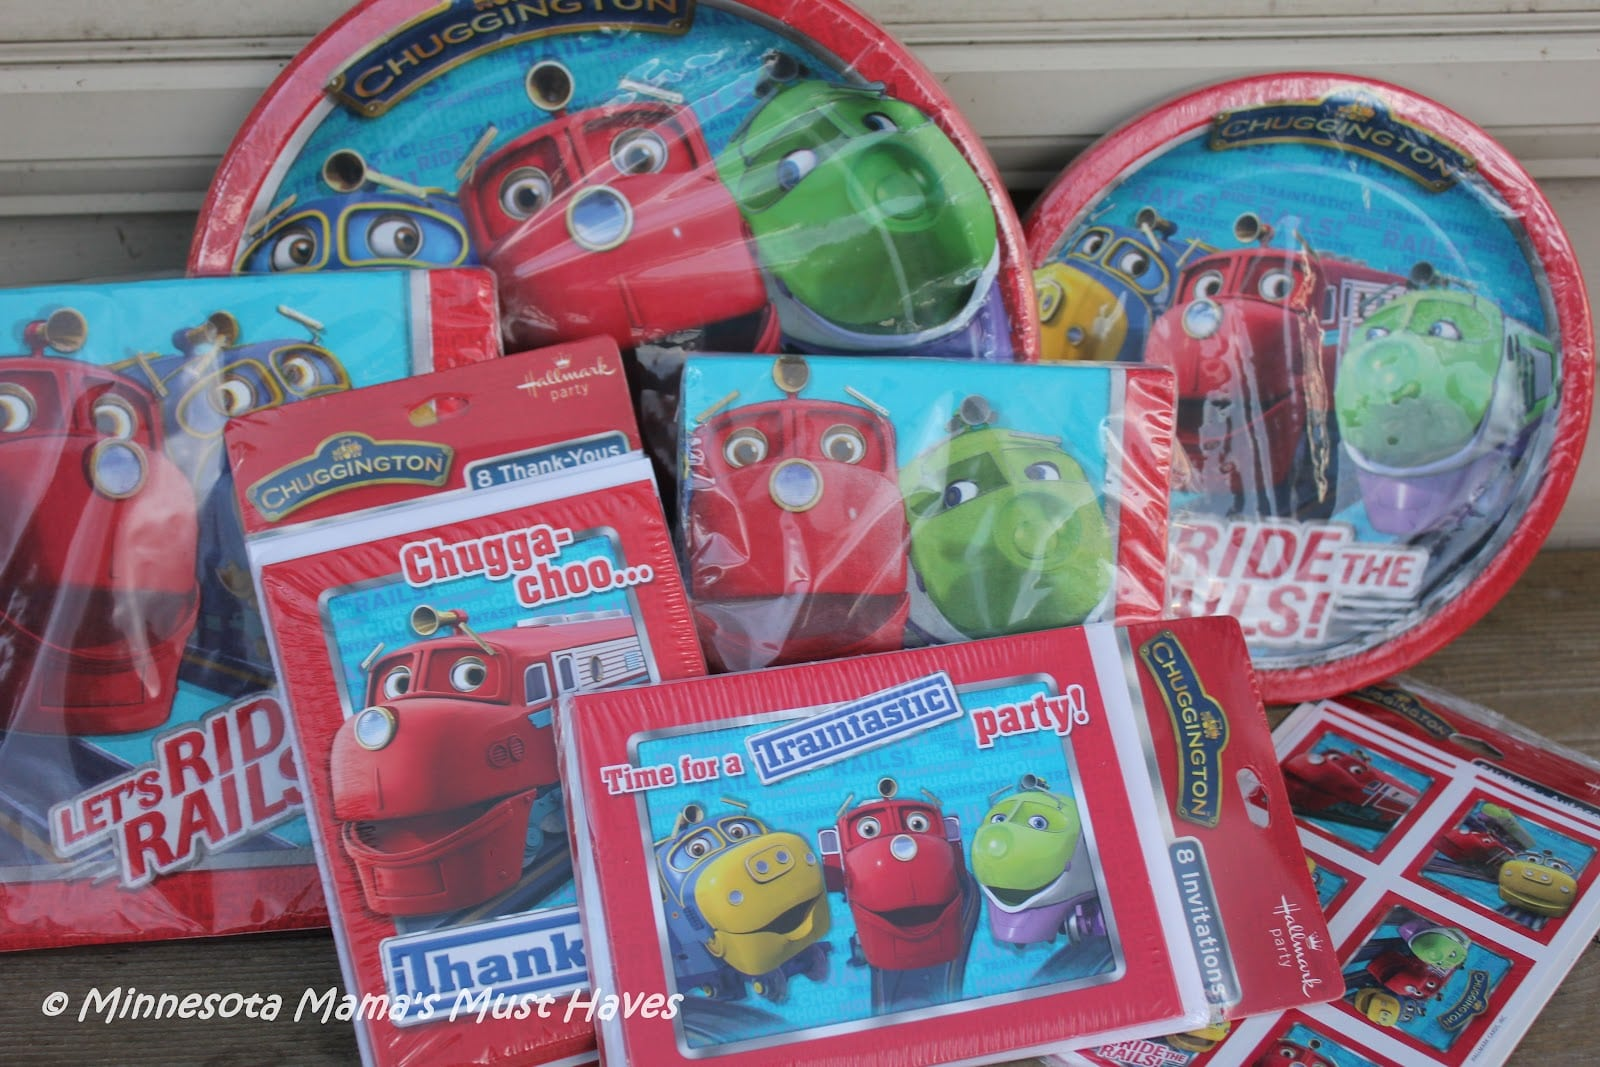 Chuggington Birthday Party Supplies! {hallmark Party Supply Review